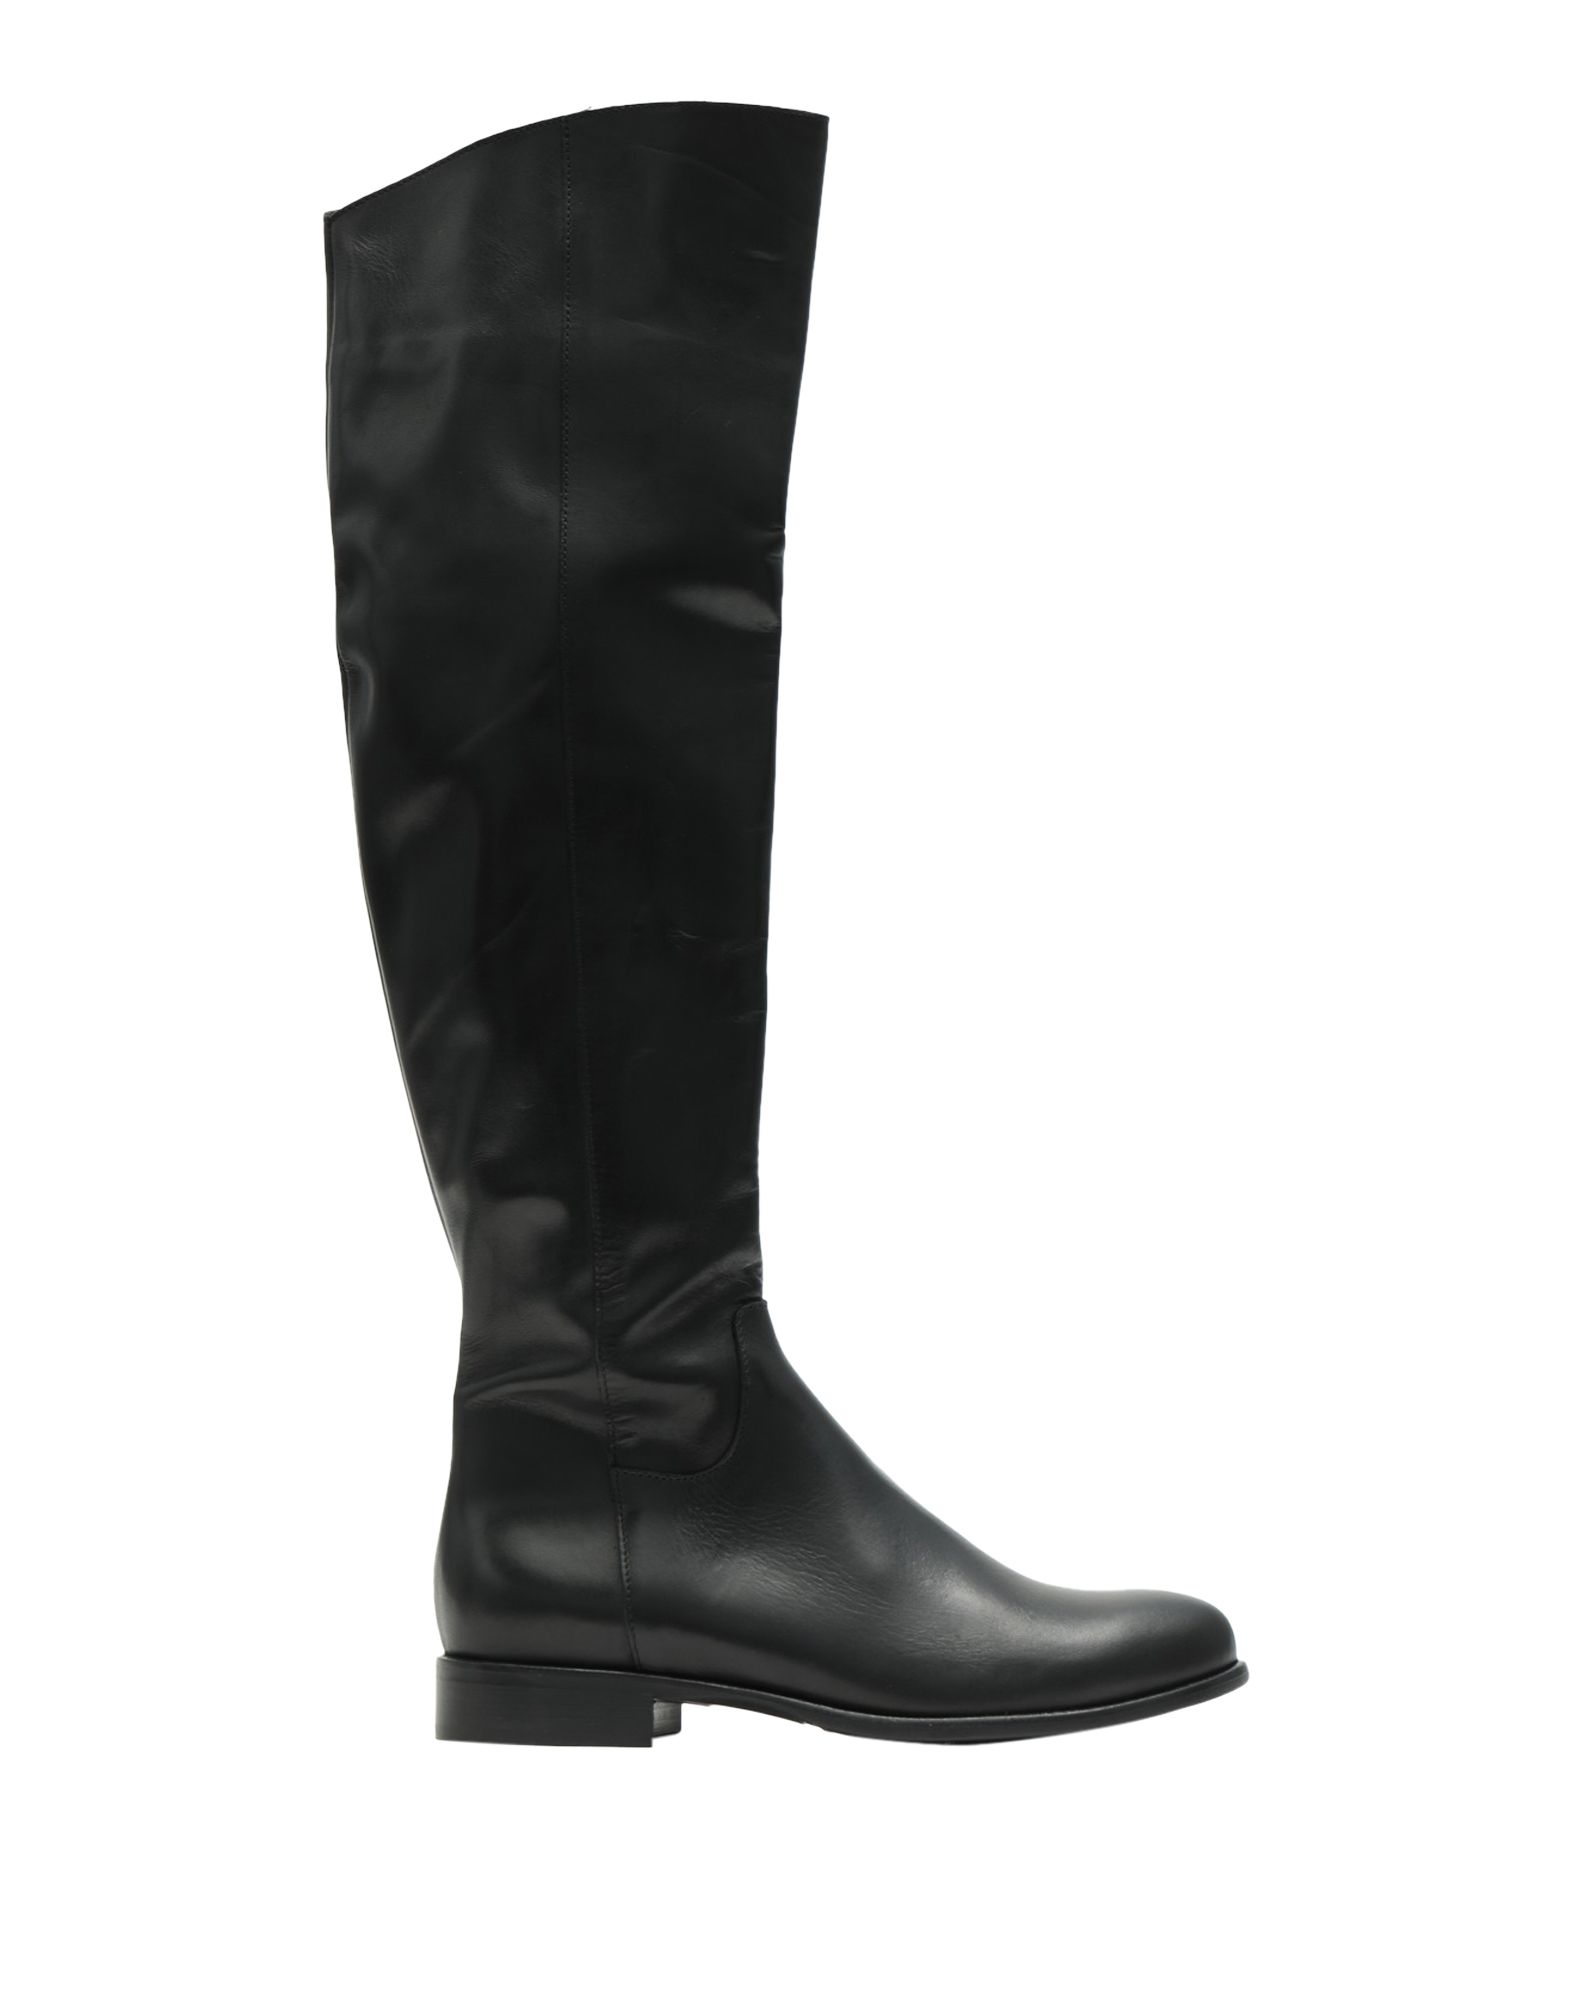 Leonardo Principi Boots - Women on Leonardo Principi Boots online on Women  Canada - 11537614MN e6689f